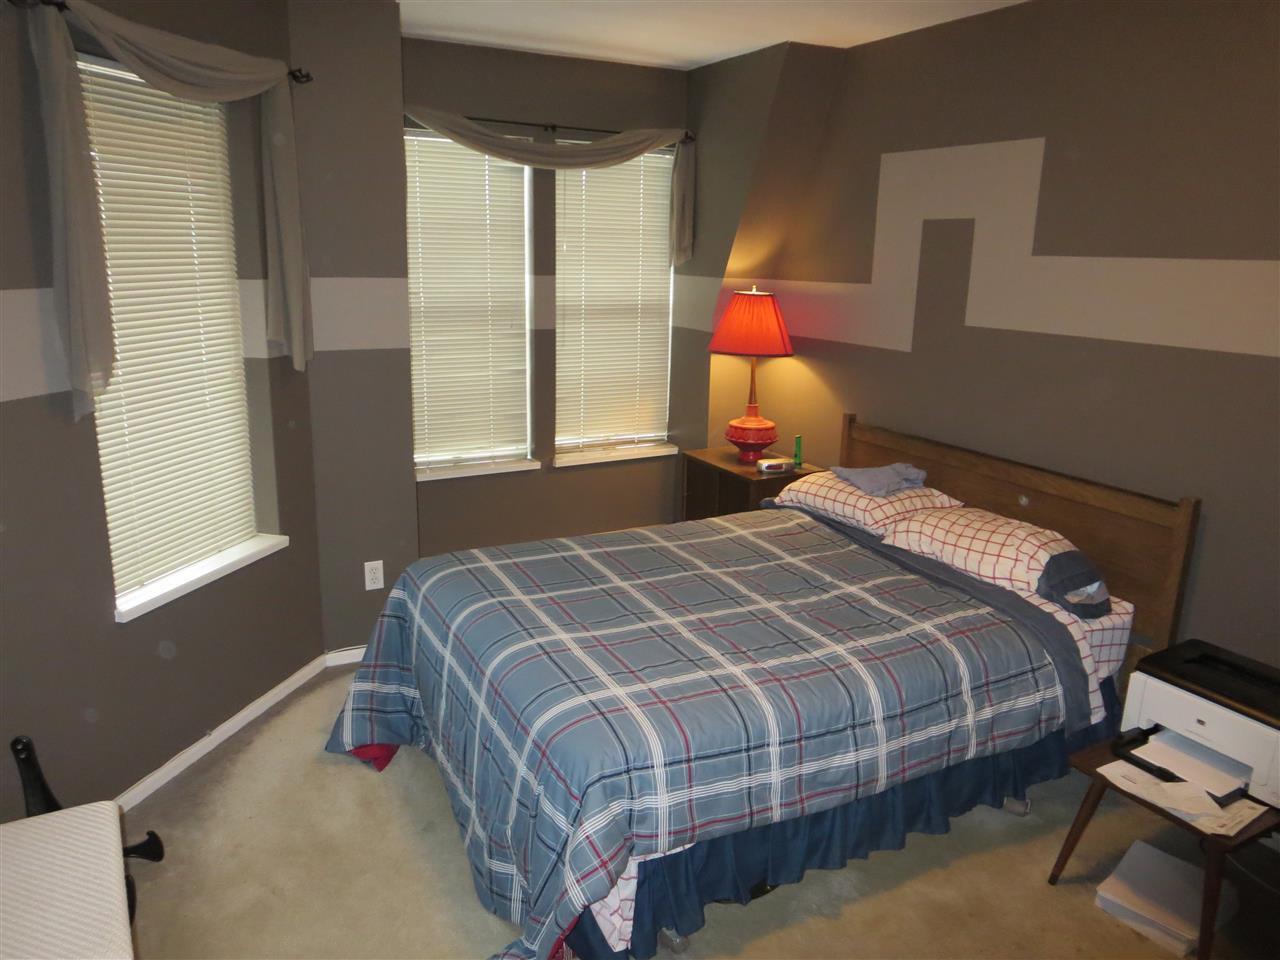 Photo 13: Photos: 317 98 LAVAL Street in Coquitlam: Maillardville Condo for sale : MLS®# R2117700